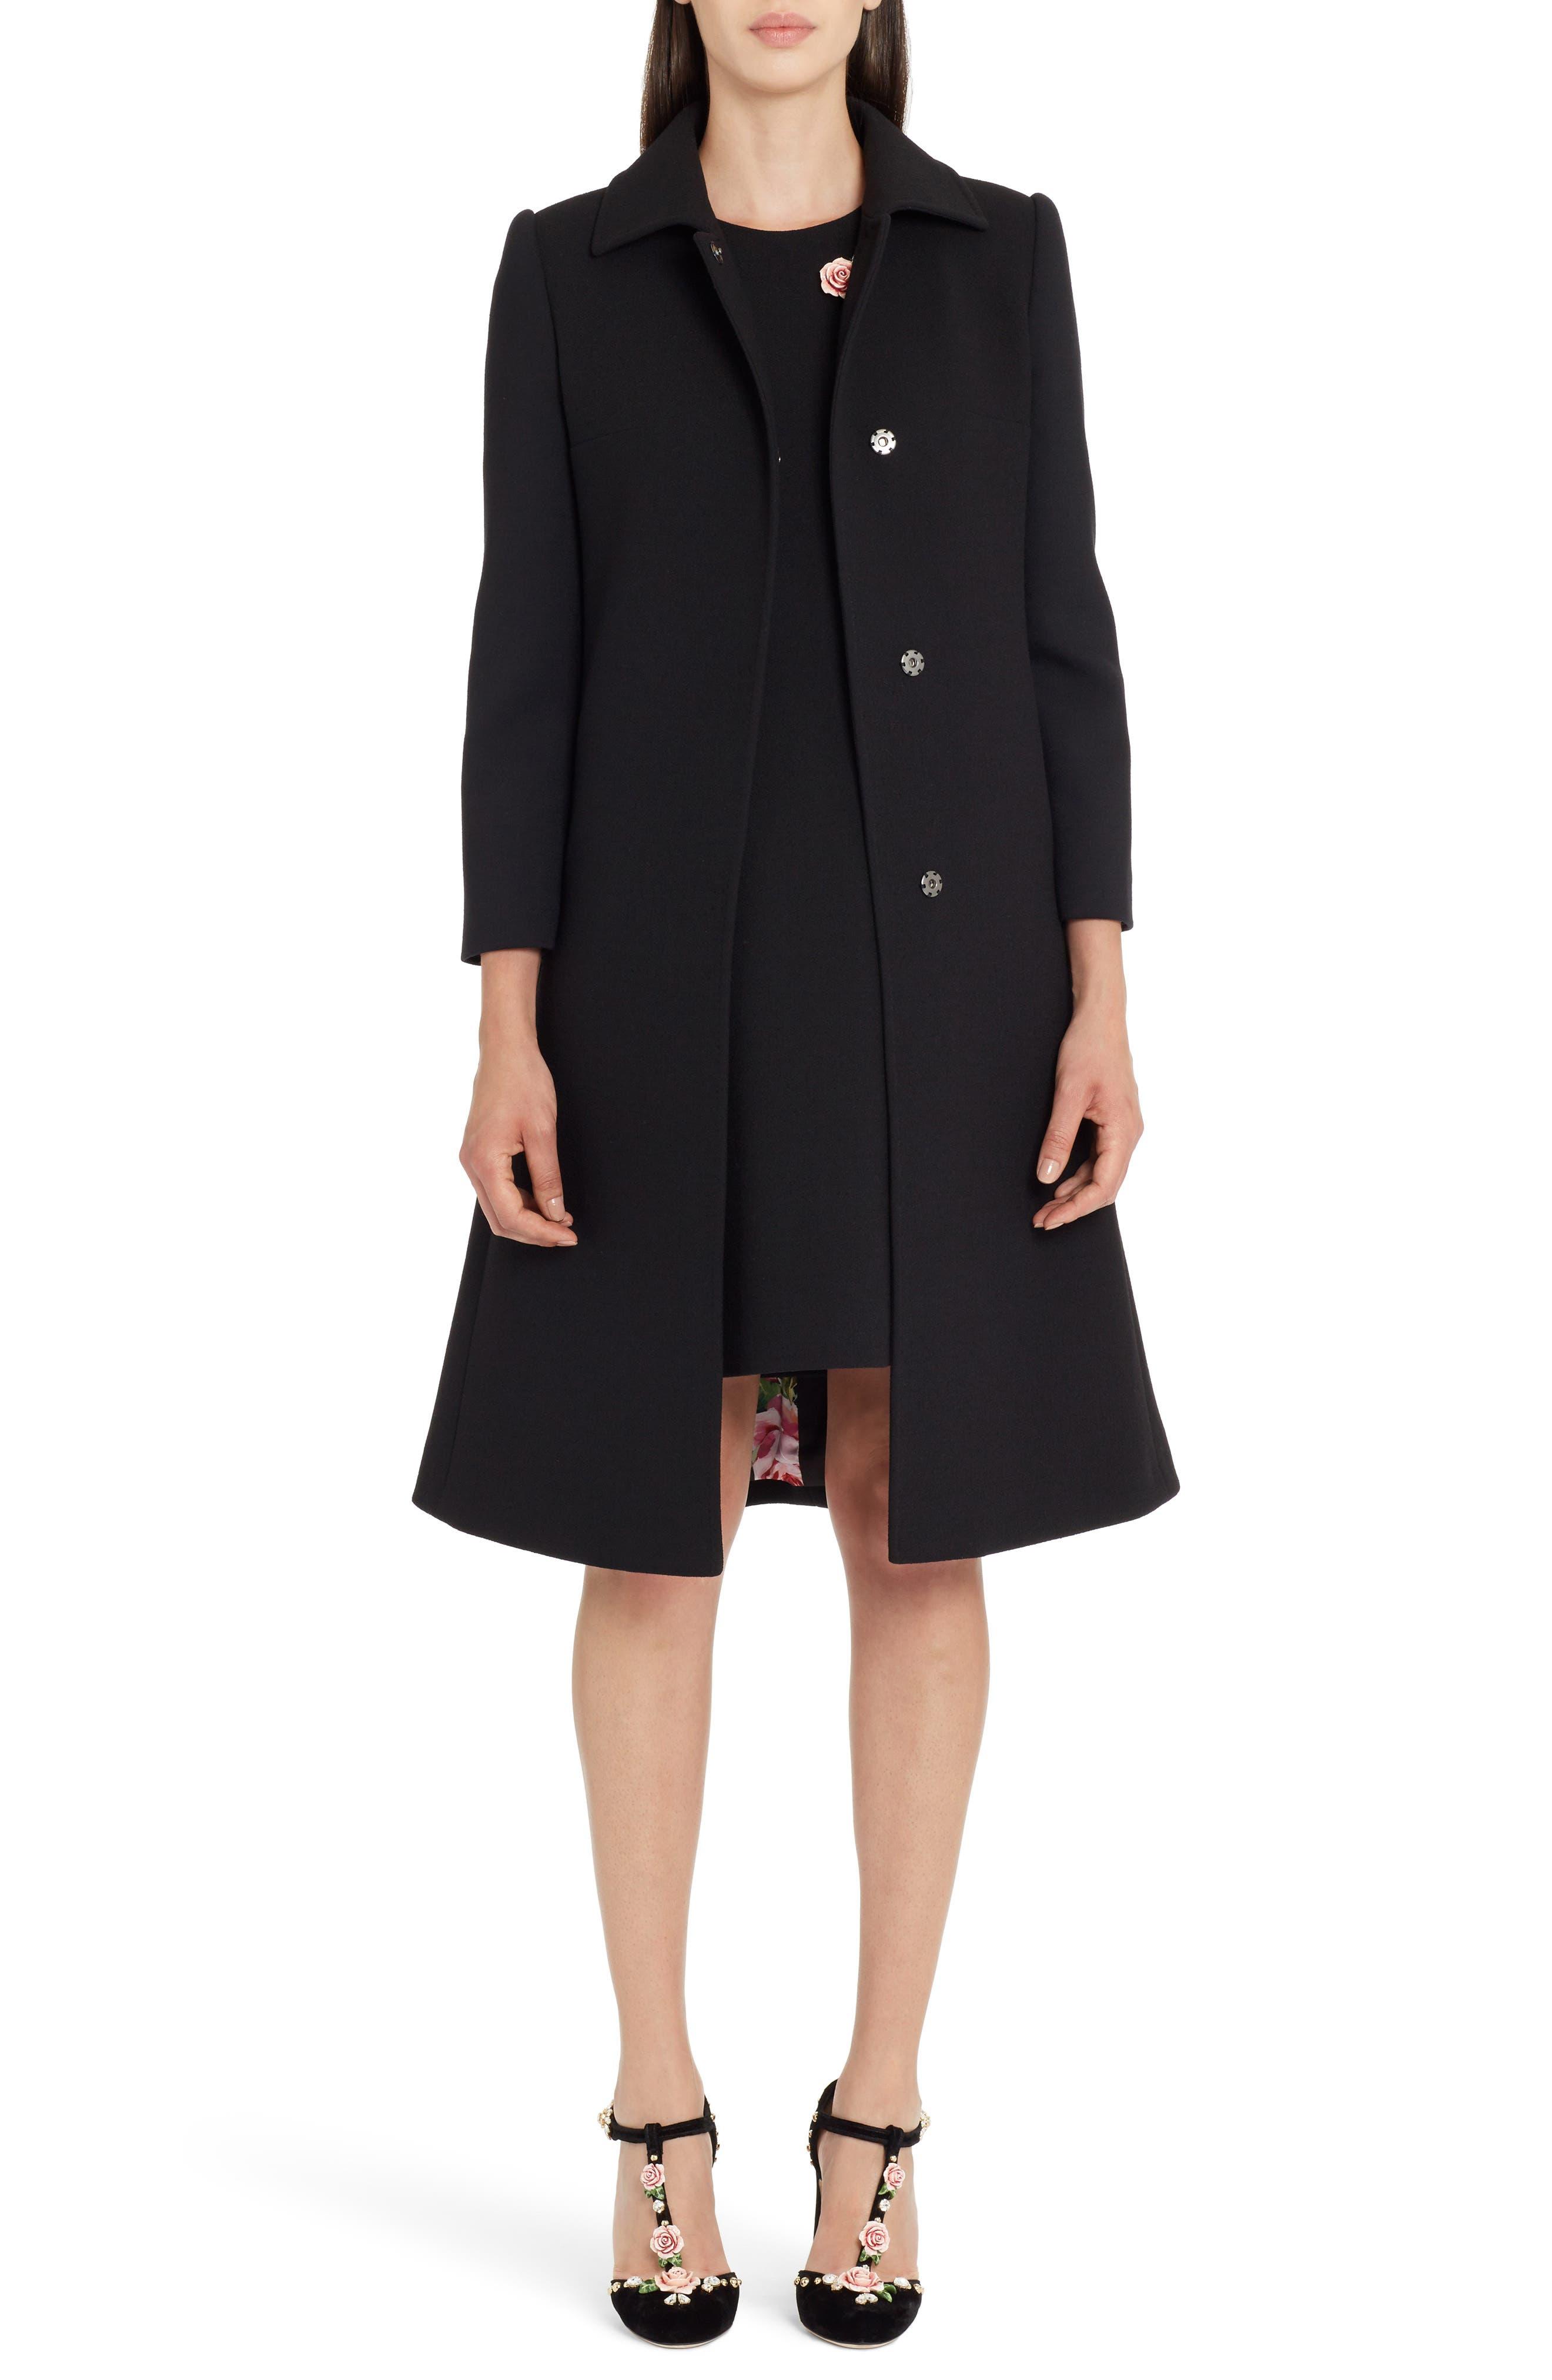 Alternate Image 1 Selected - Dolce&Gabbana Stretch Wool Crepe Coat